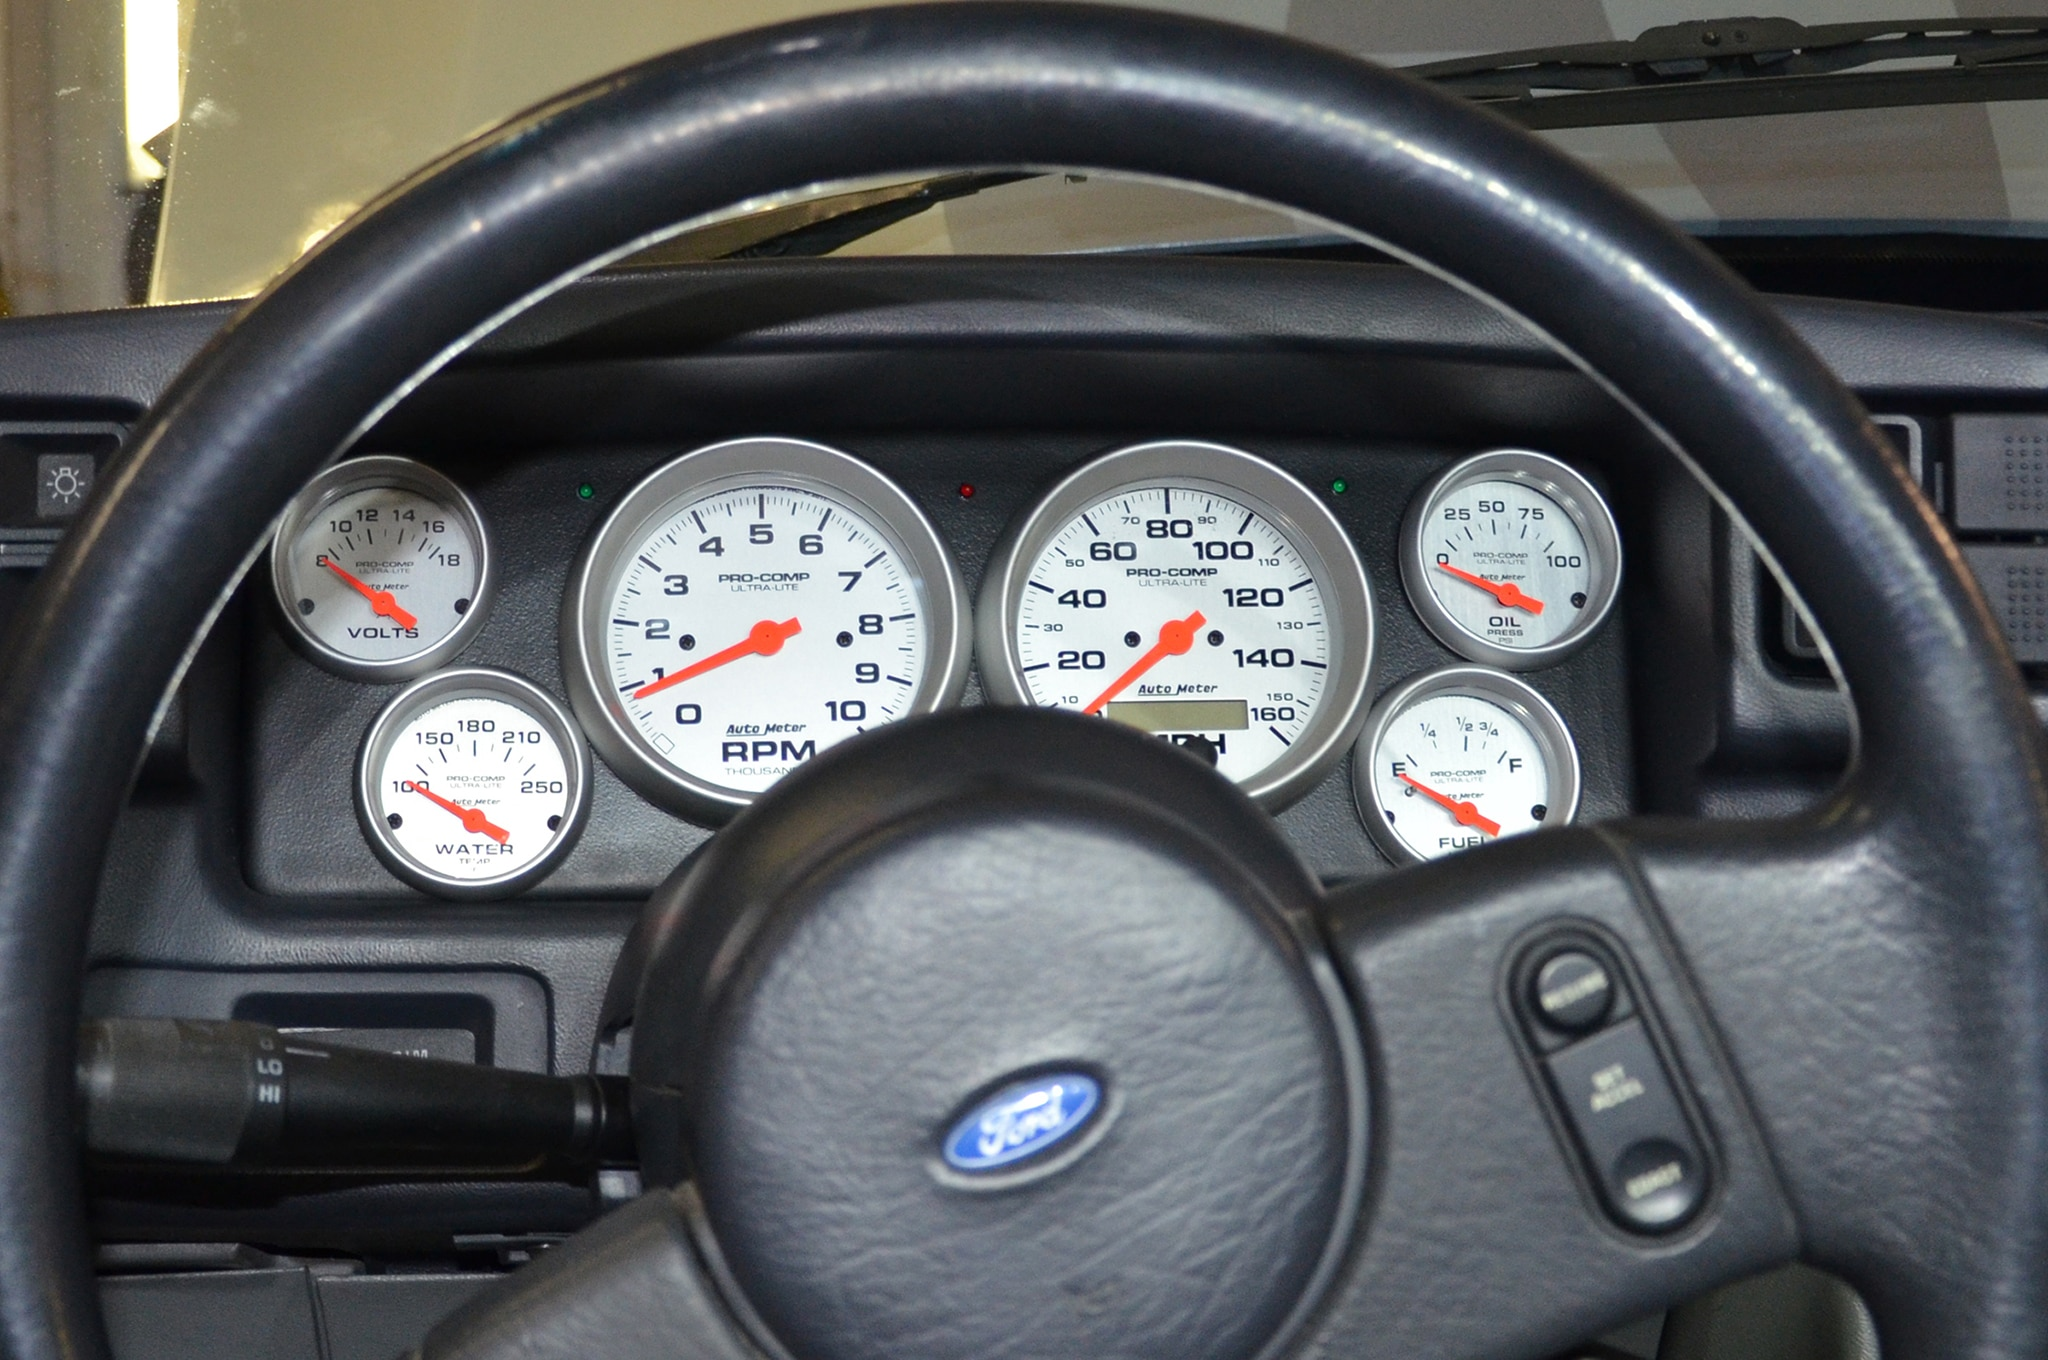 17 Classic Dash Gauge Panel Installed